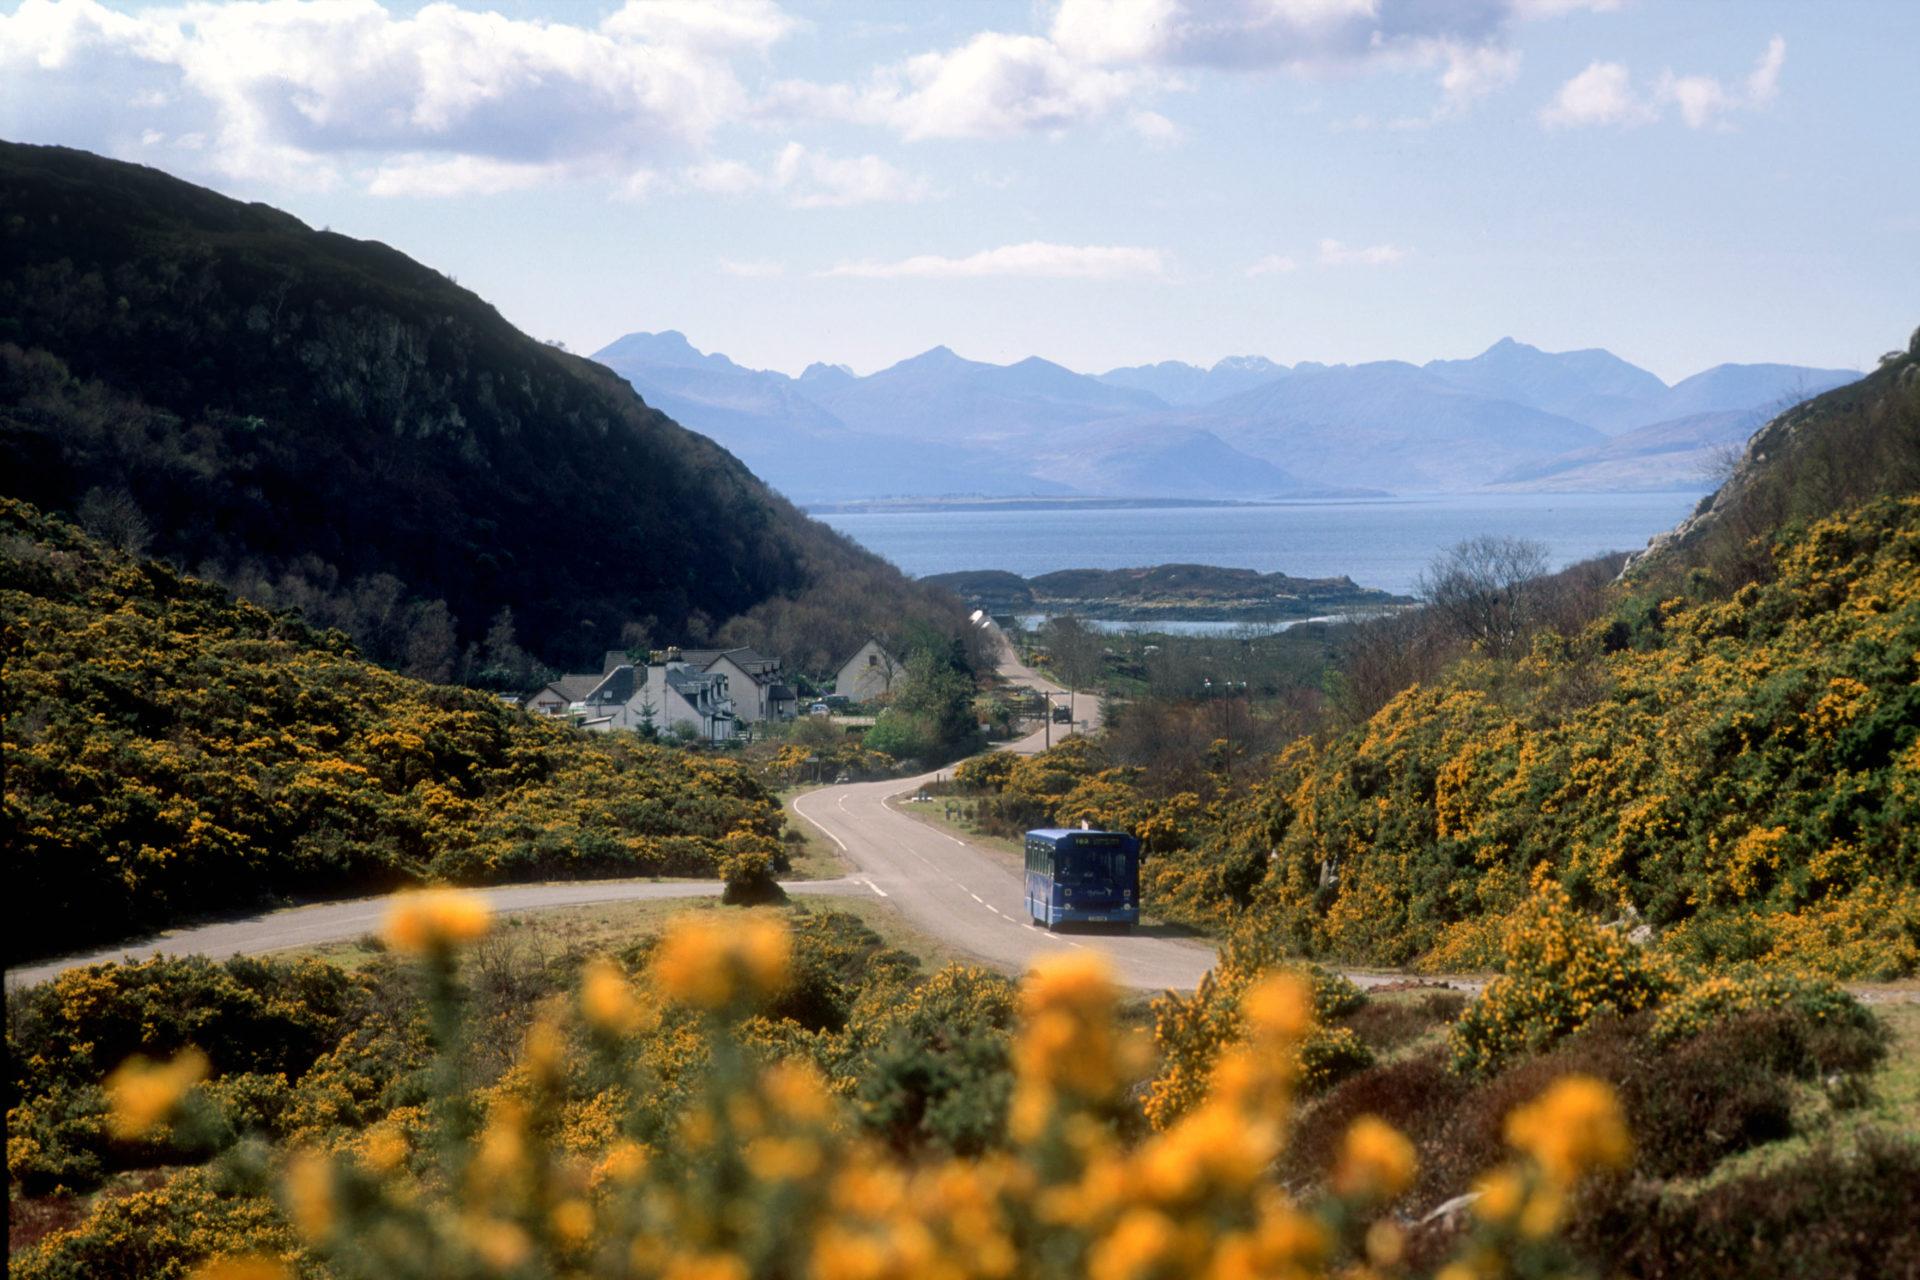 Schotland, Het mooiste land ter wereld 6-daagse luxe reis v.a. 990€ 4